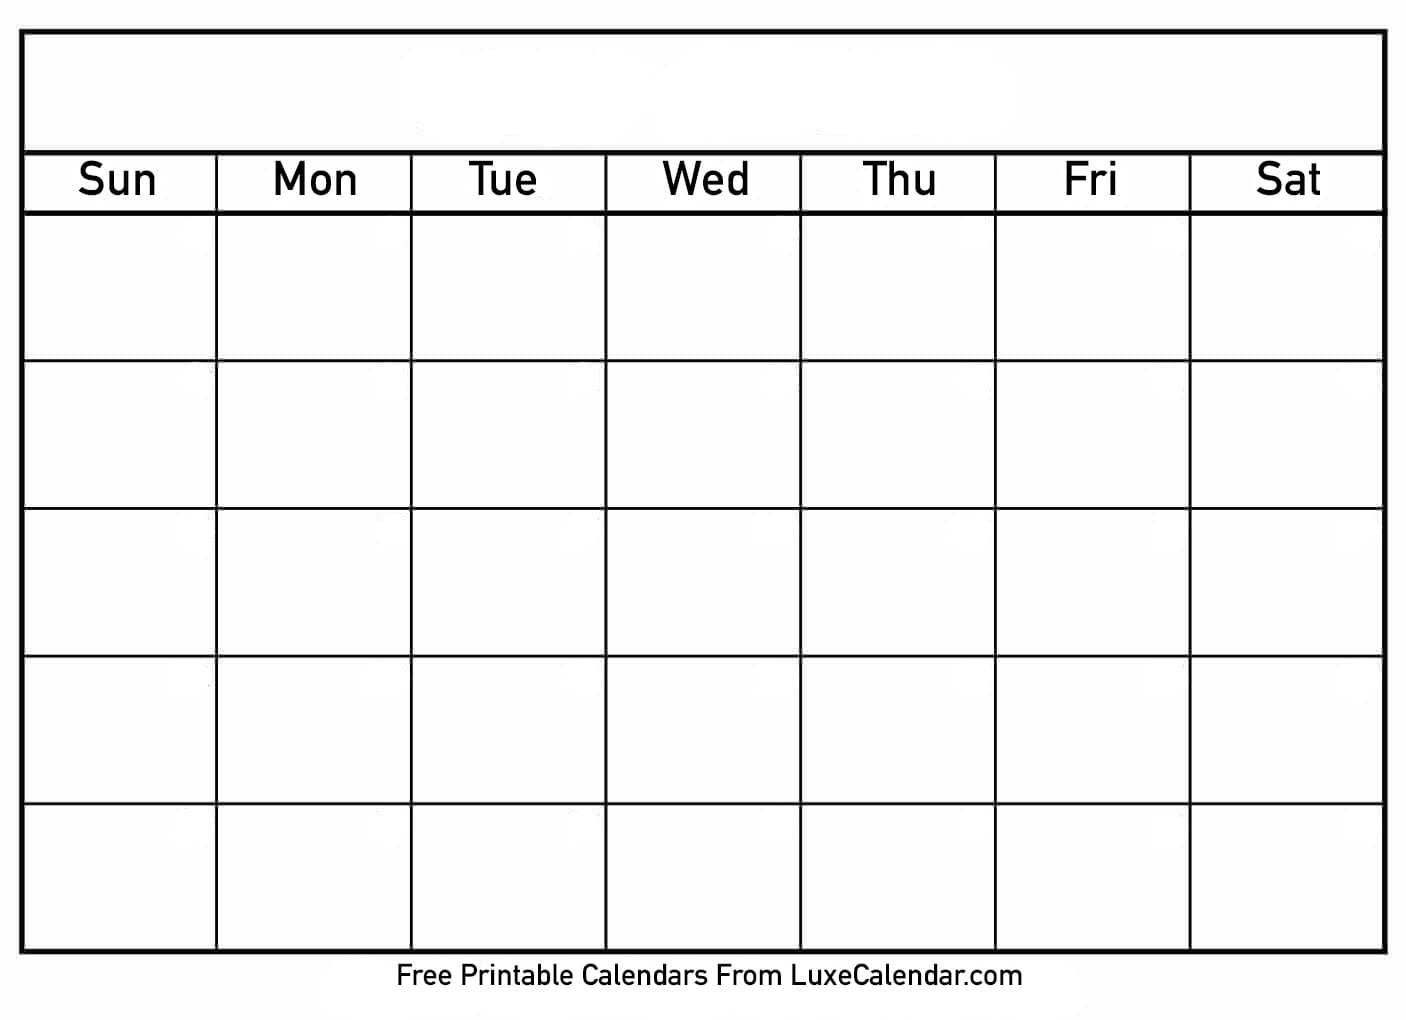 Blank Printable Calendar - Luxe Calendar in To Fill In Blankcalendar